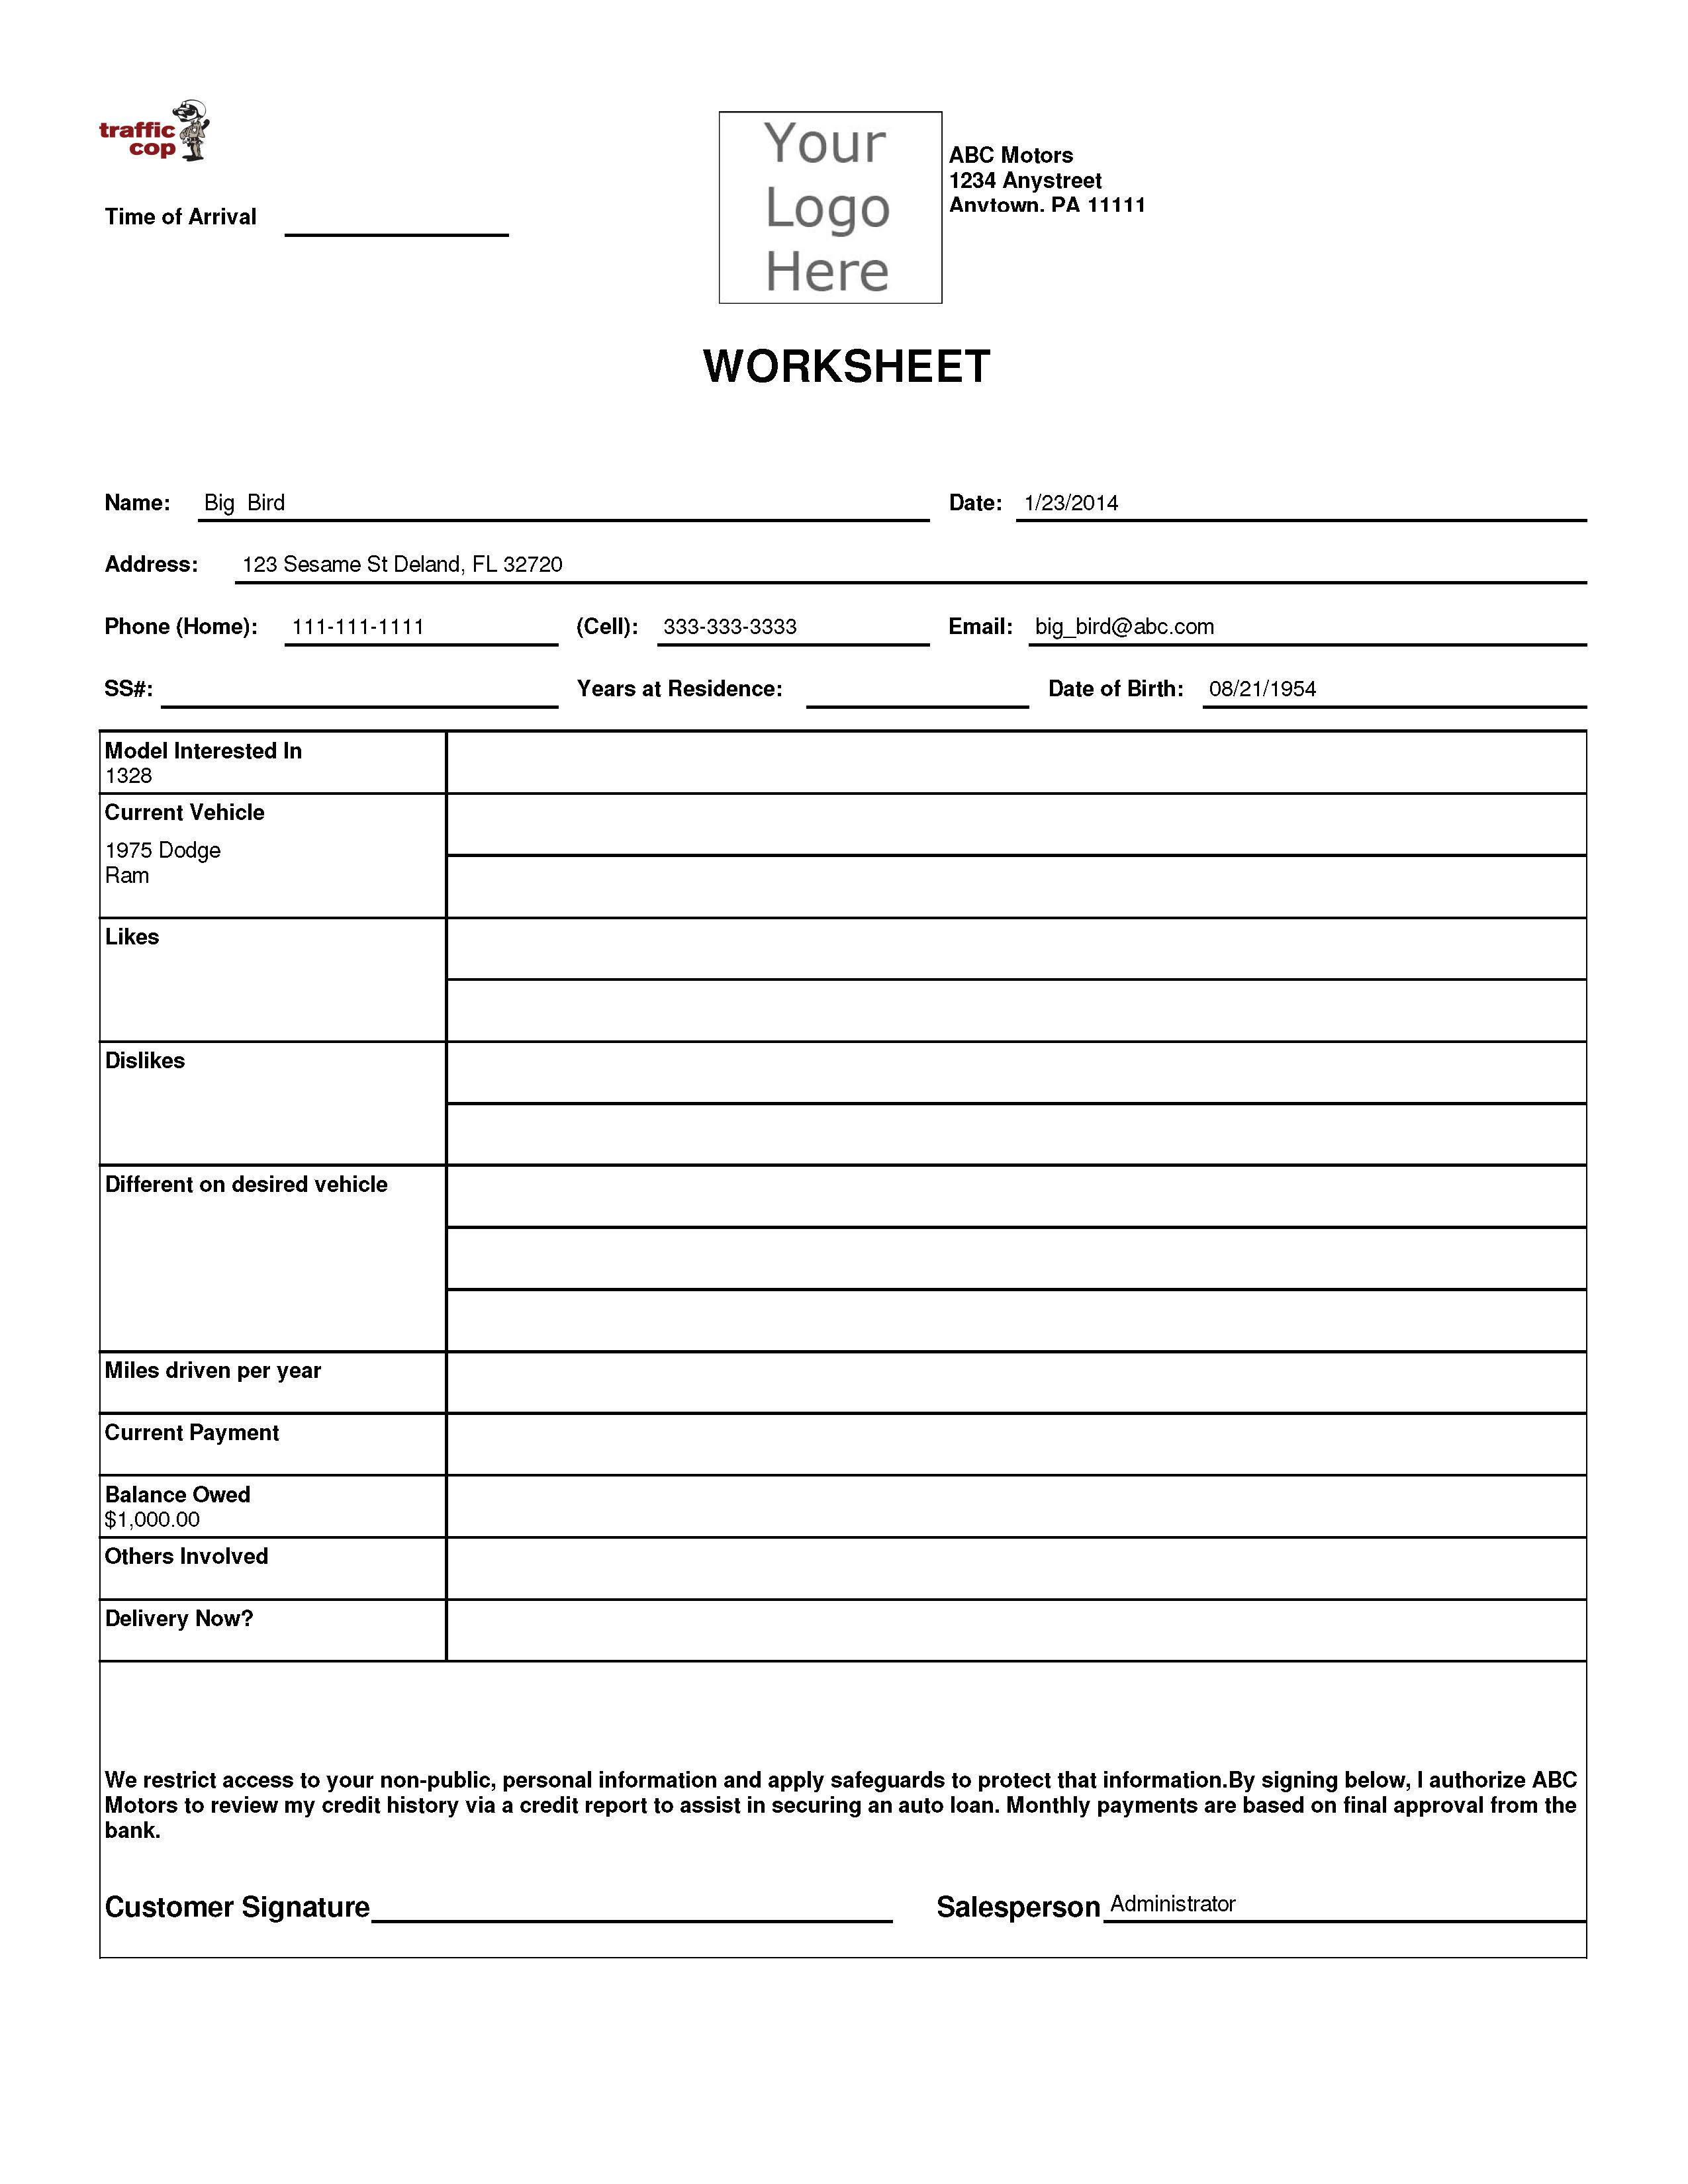 Worksheet 15 Traffic Control